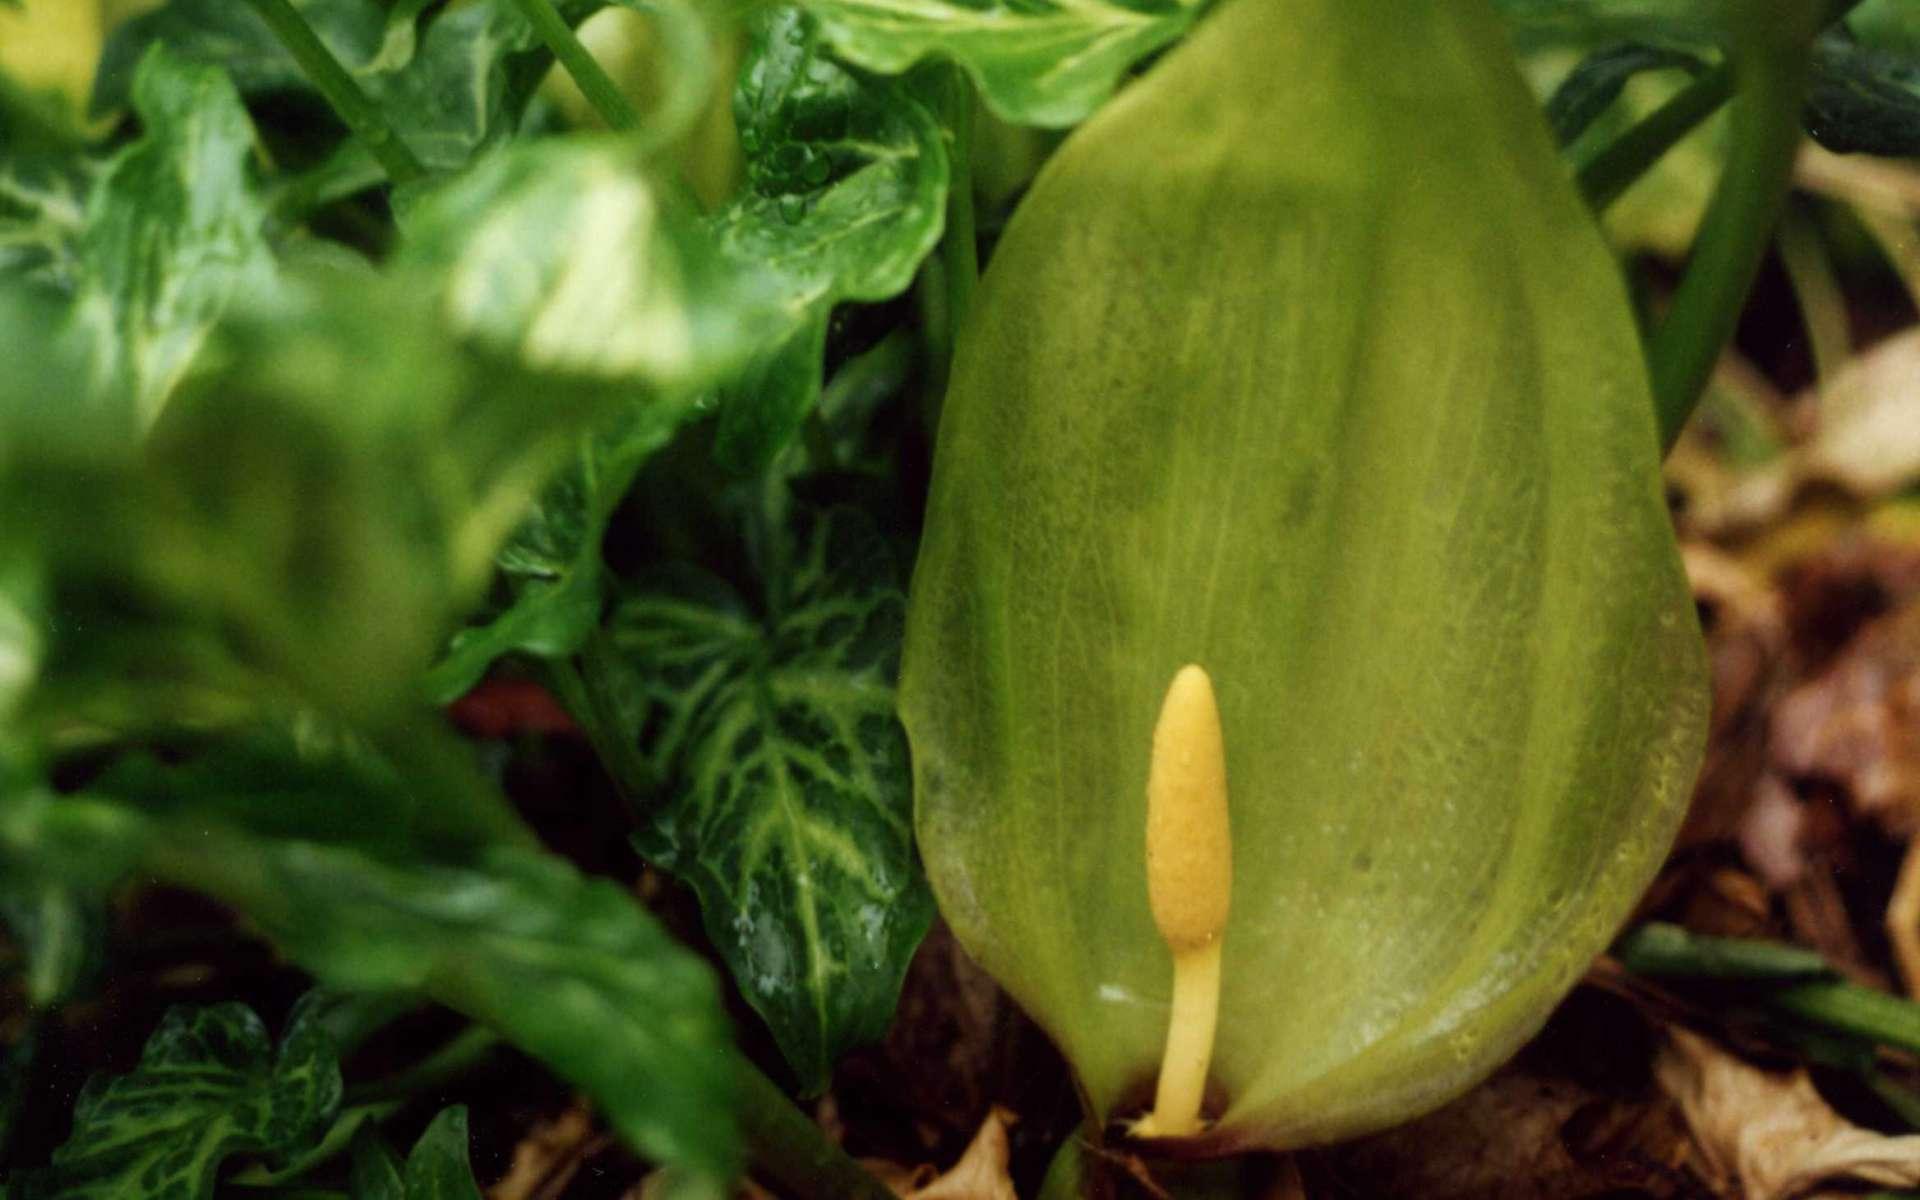 Arum d'Italie - inflorescence (Crédits : Clivid - flickr)